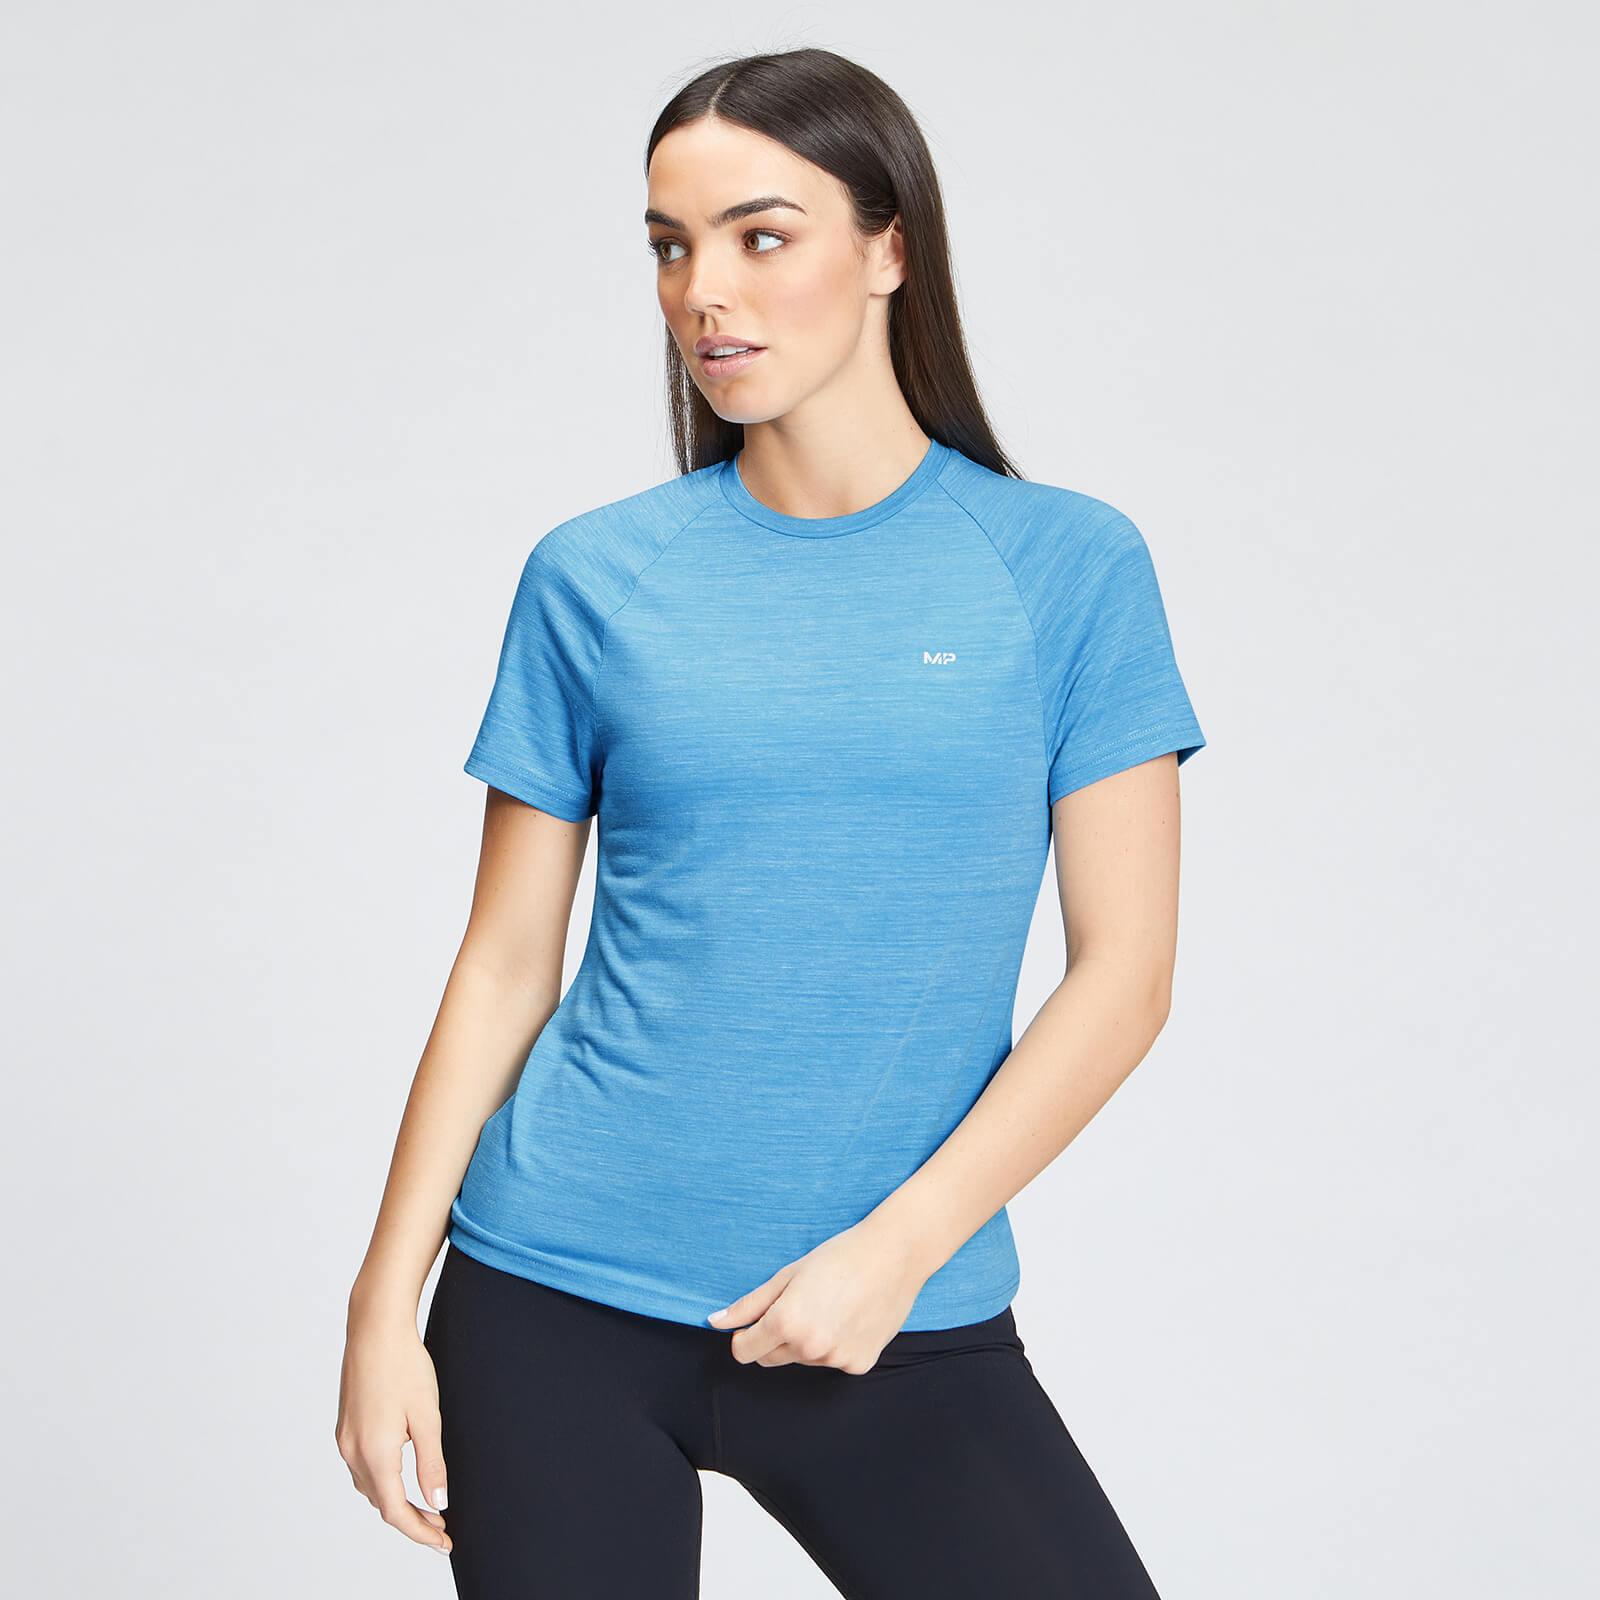 Купить MP Women's Performance Training T-Shirt - Bright Blue Marl with White Fleck - XL, Myprotein International